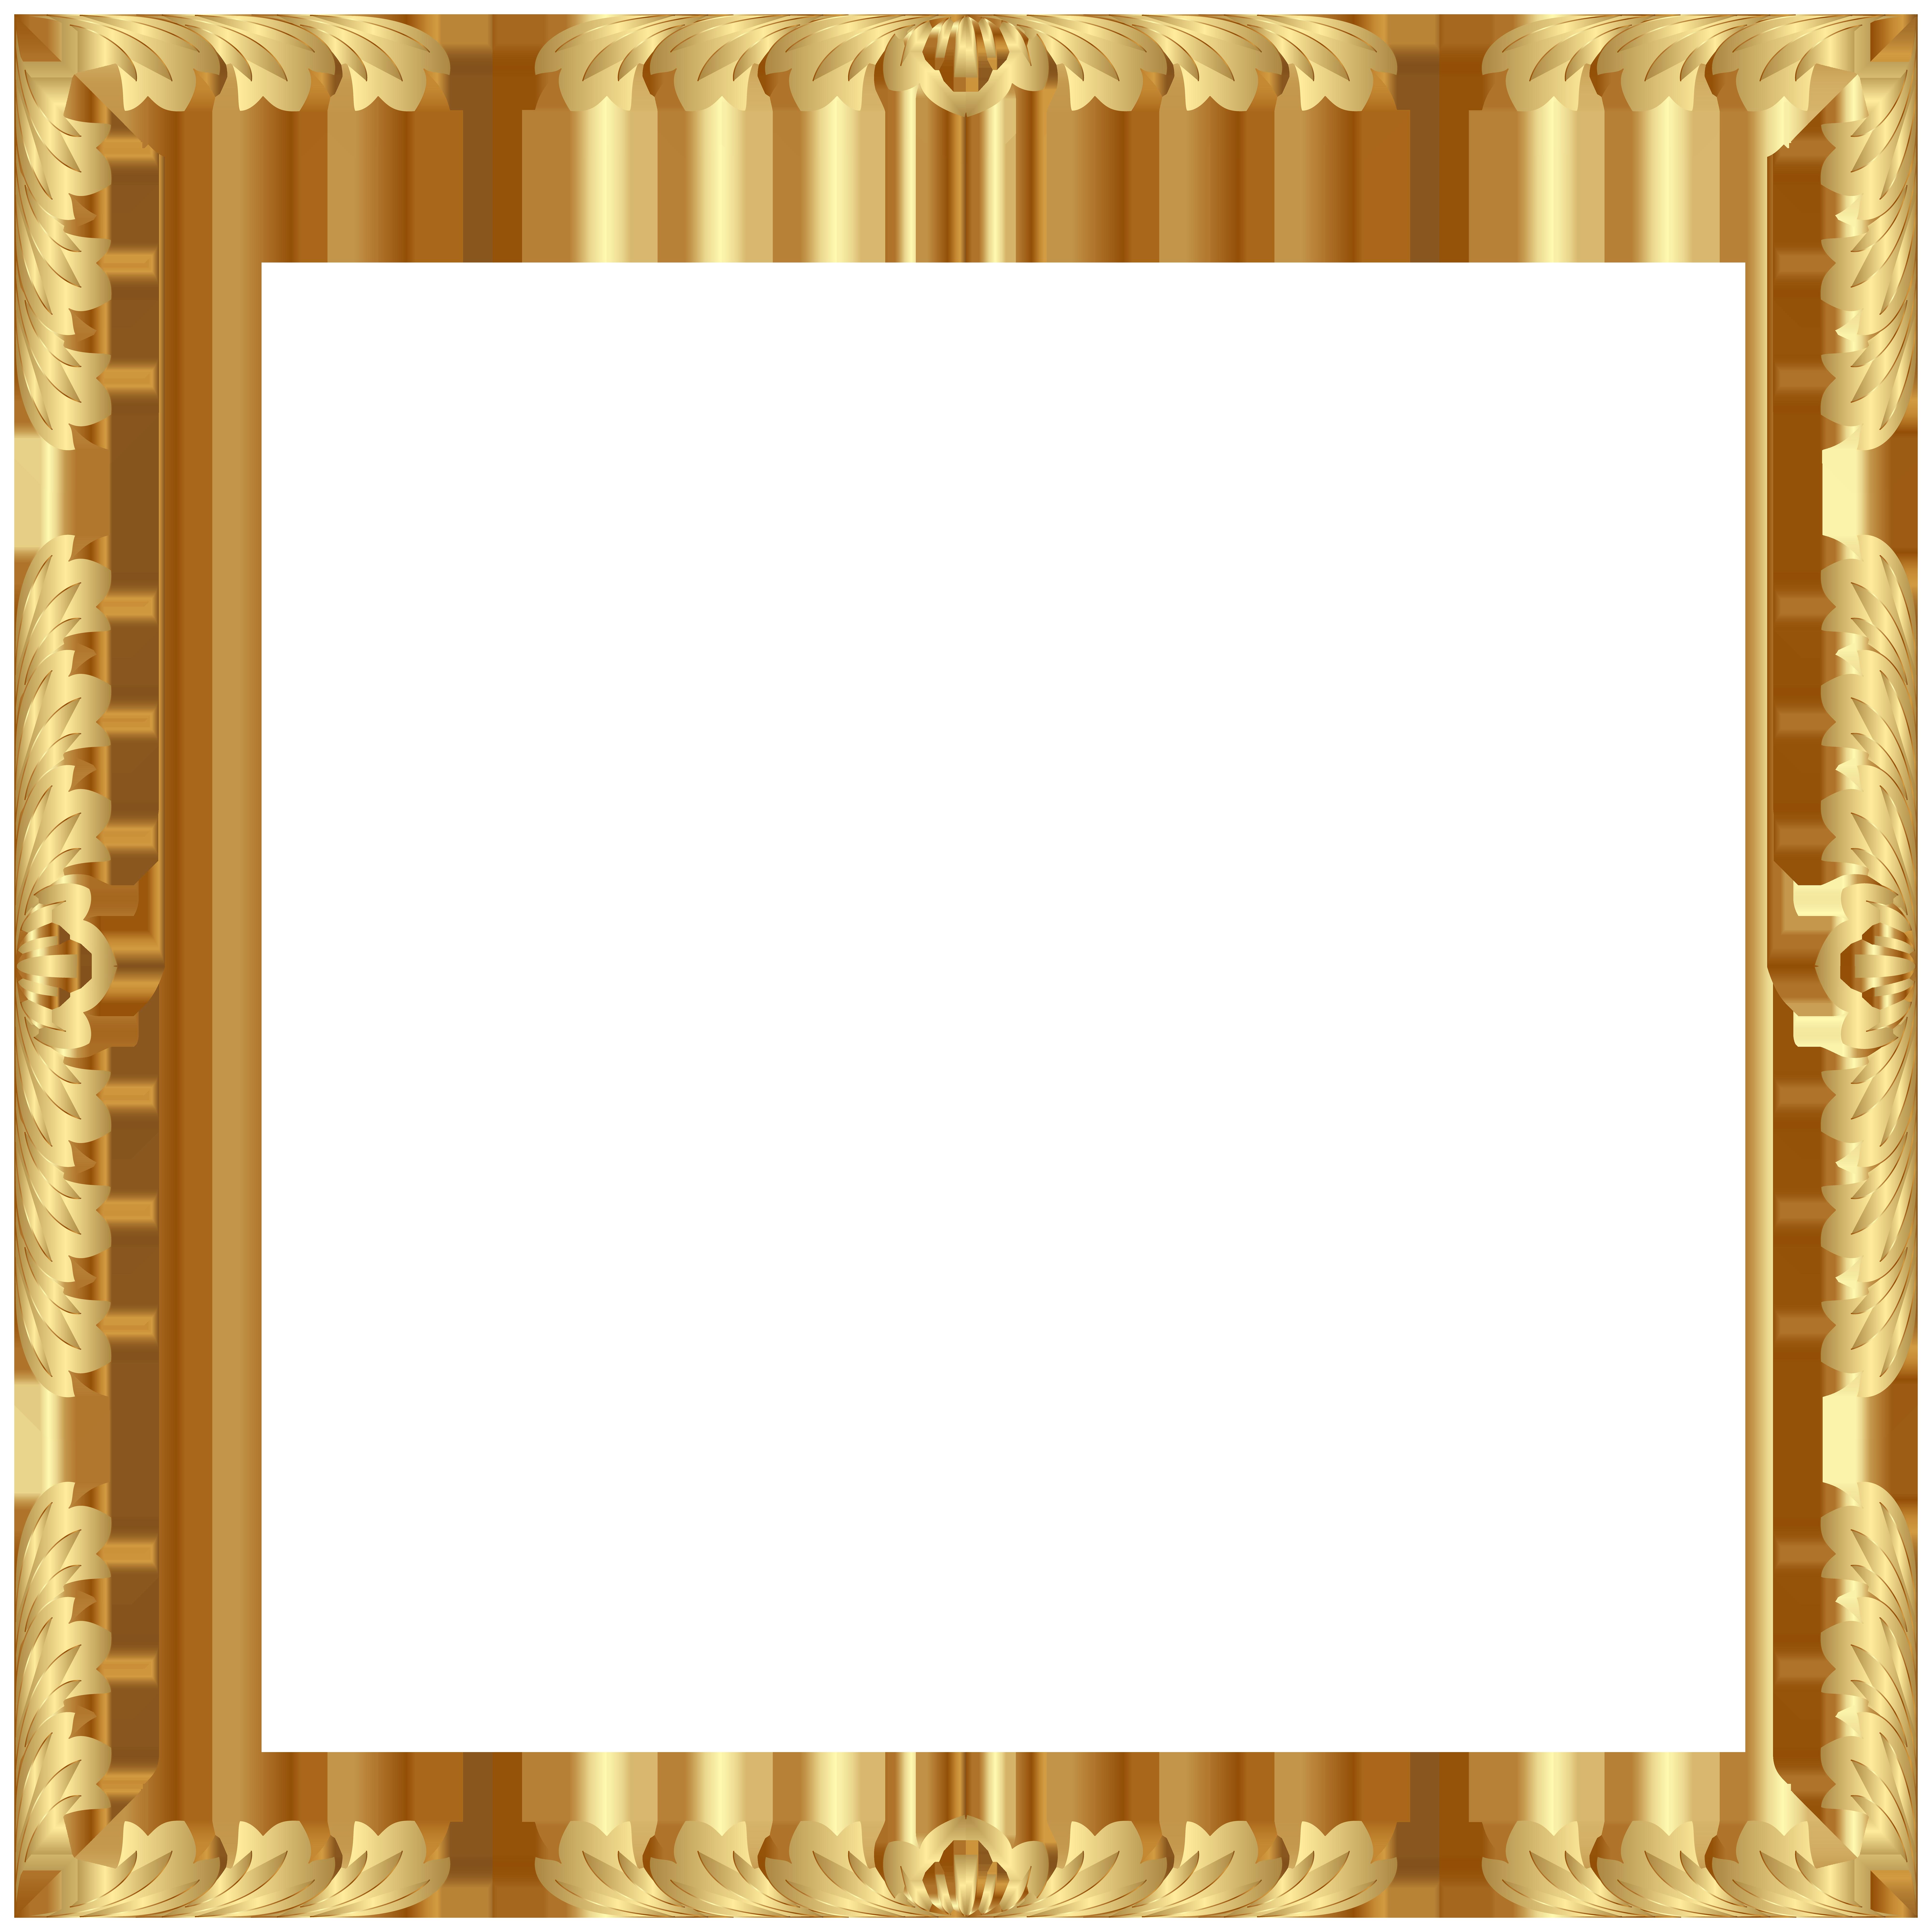 Decorative Border Frame Transparent Clip Art PNG Image Gallery